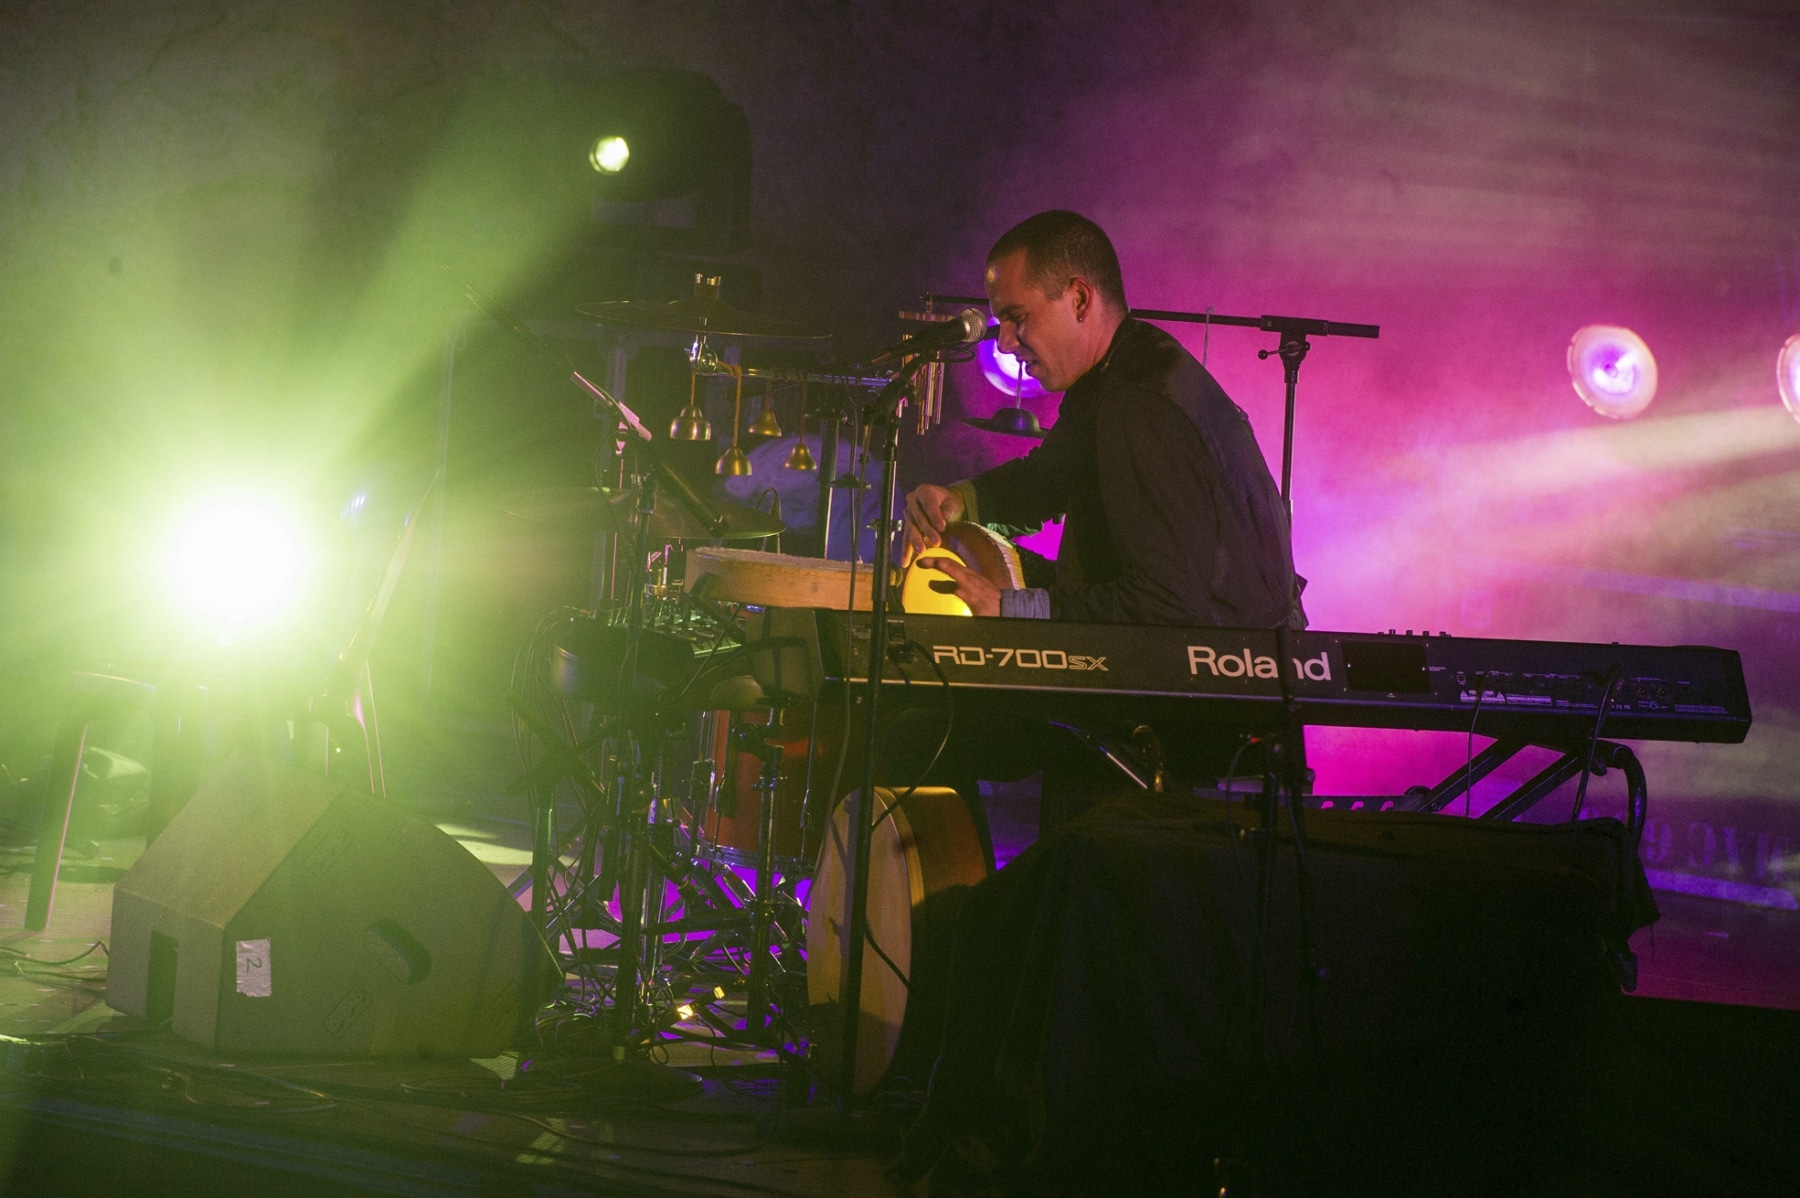 19-junio-gibraltar-world-music-festival25_14441445726_o